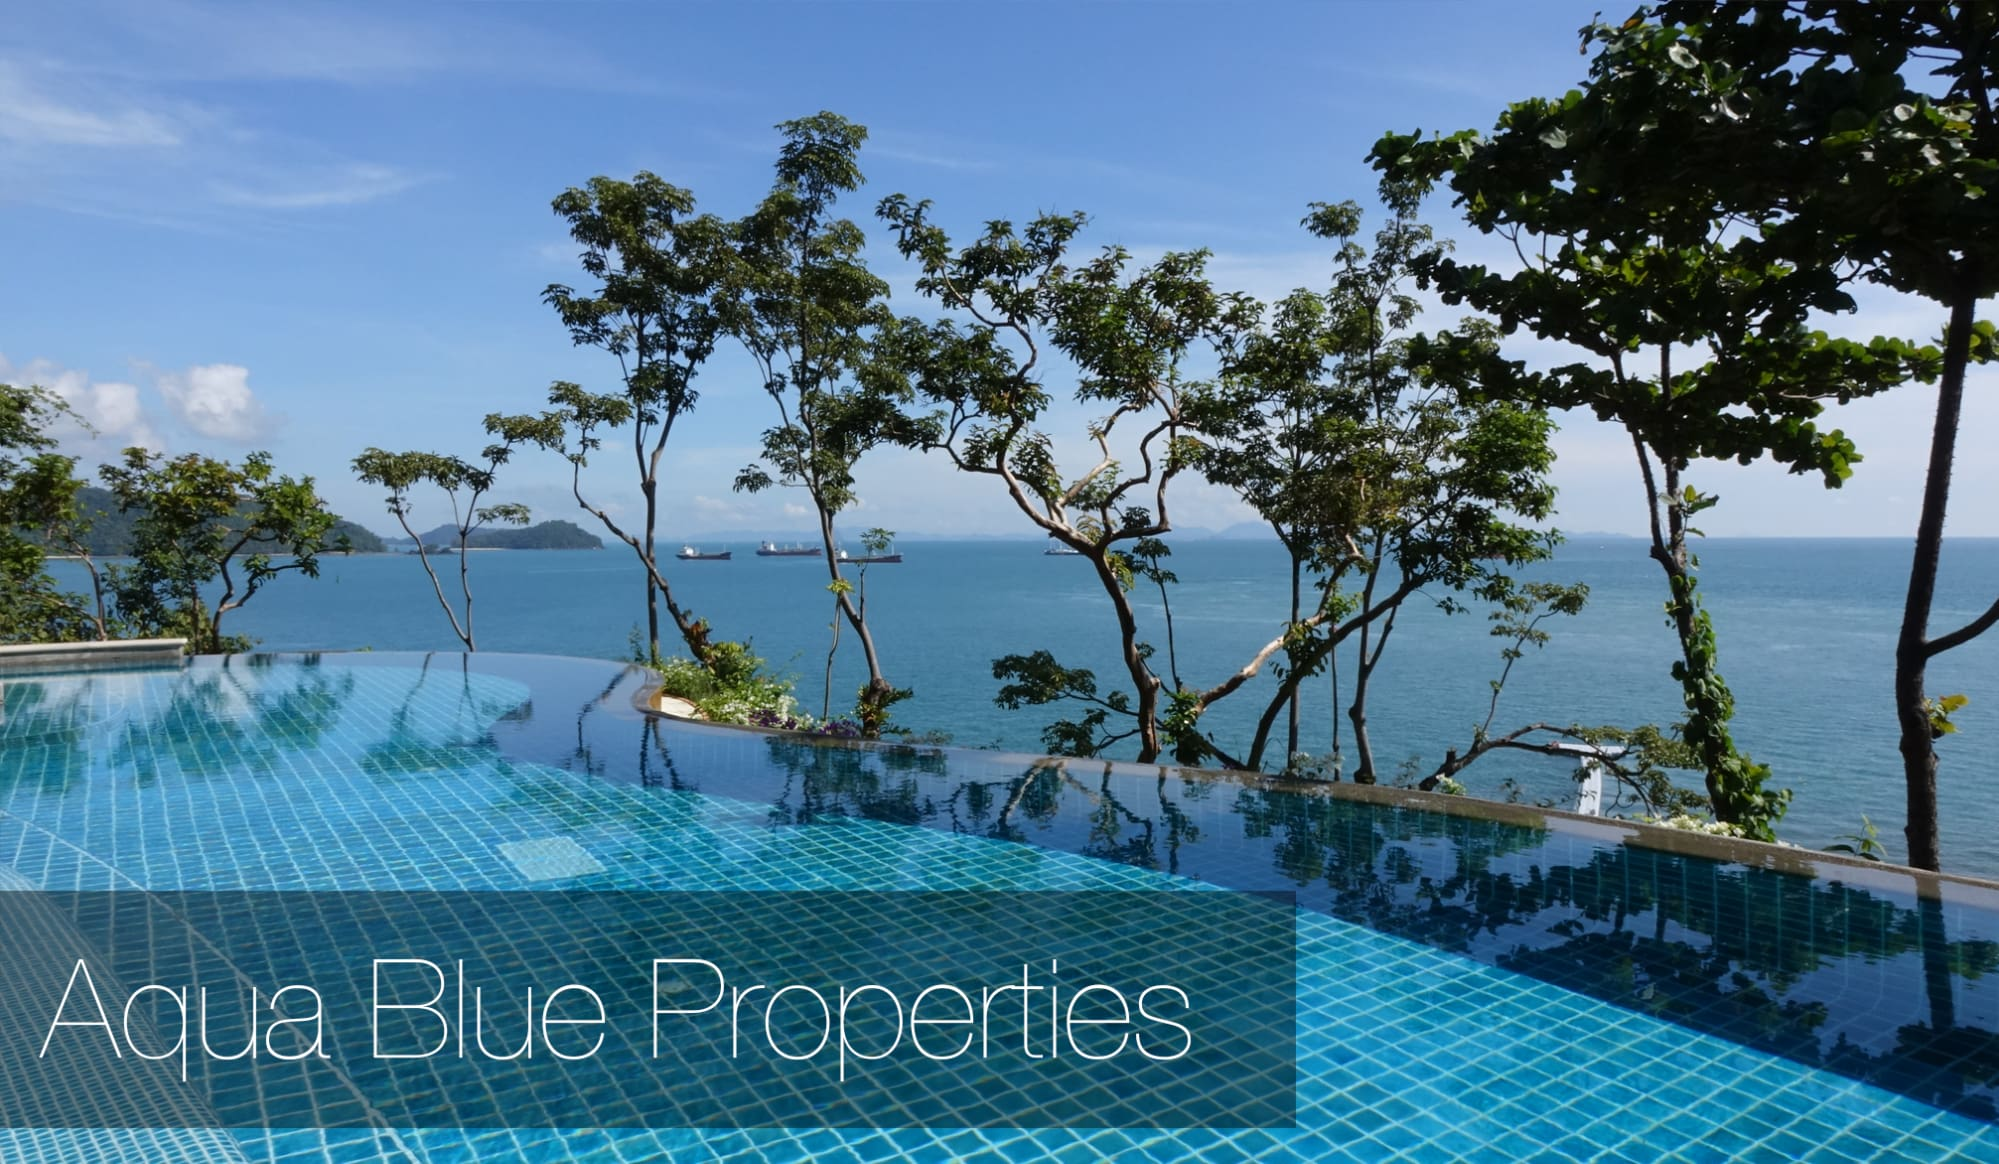 Photo of beautiful resort, with infinity pool, overlooking blue bay